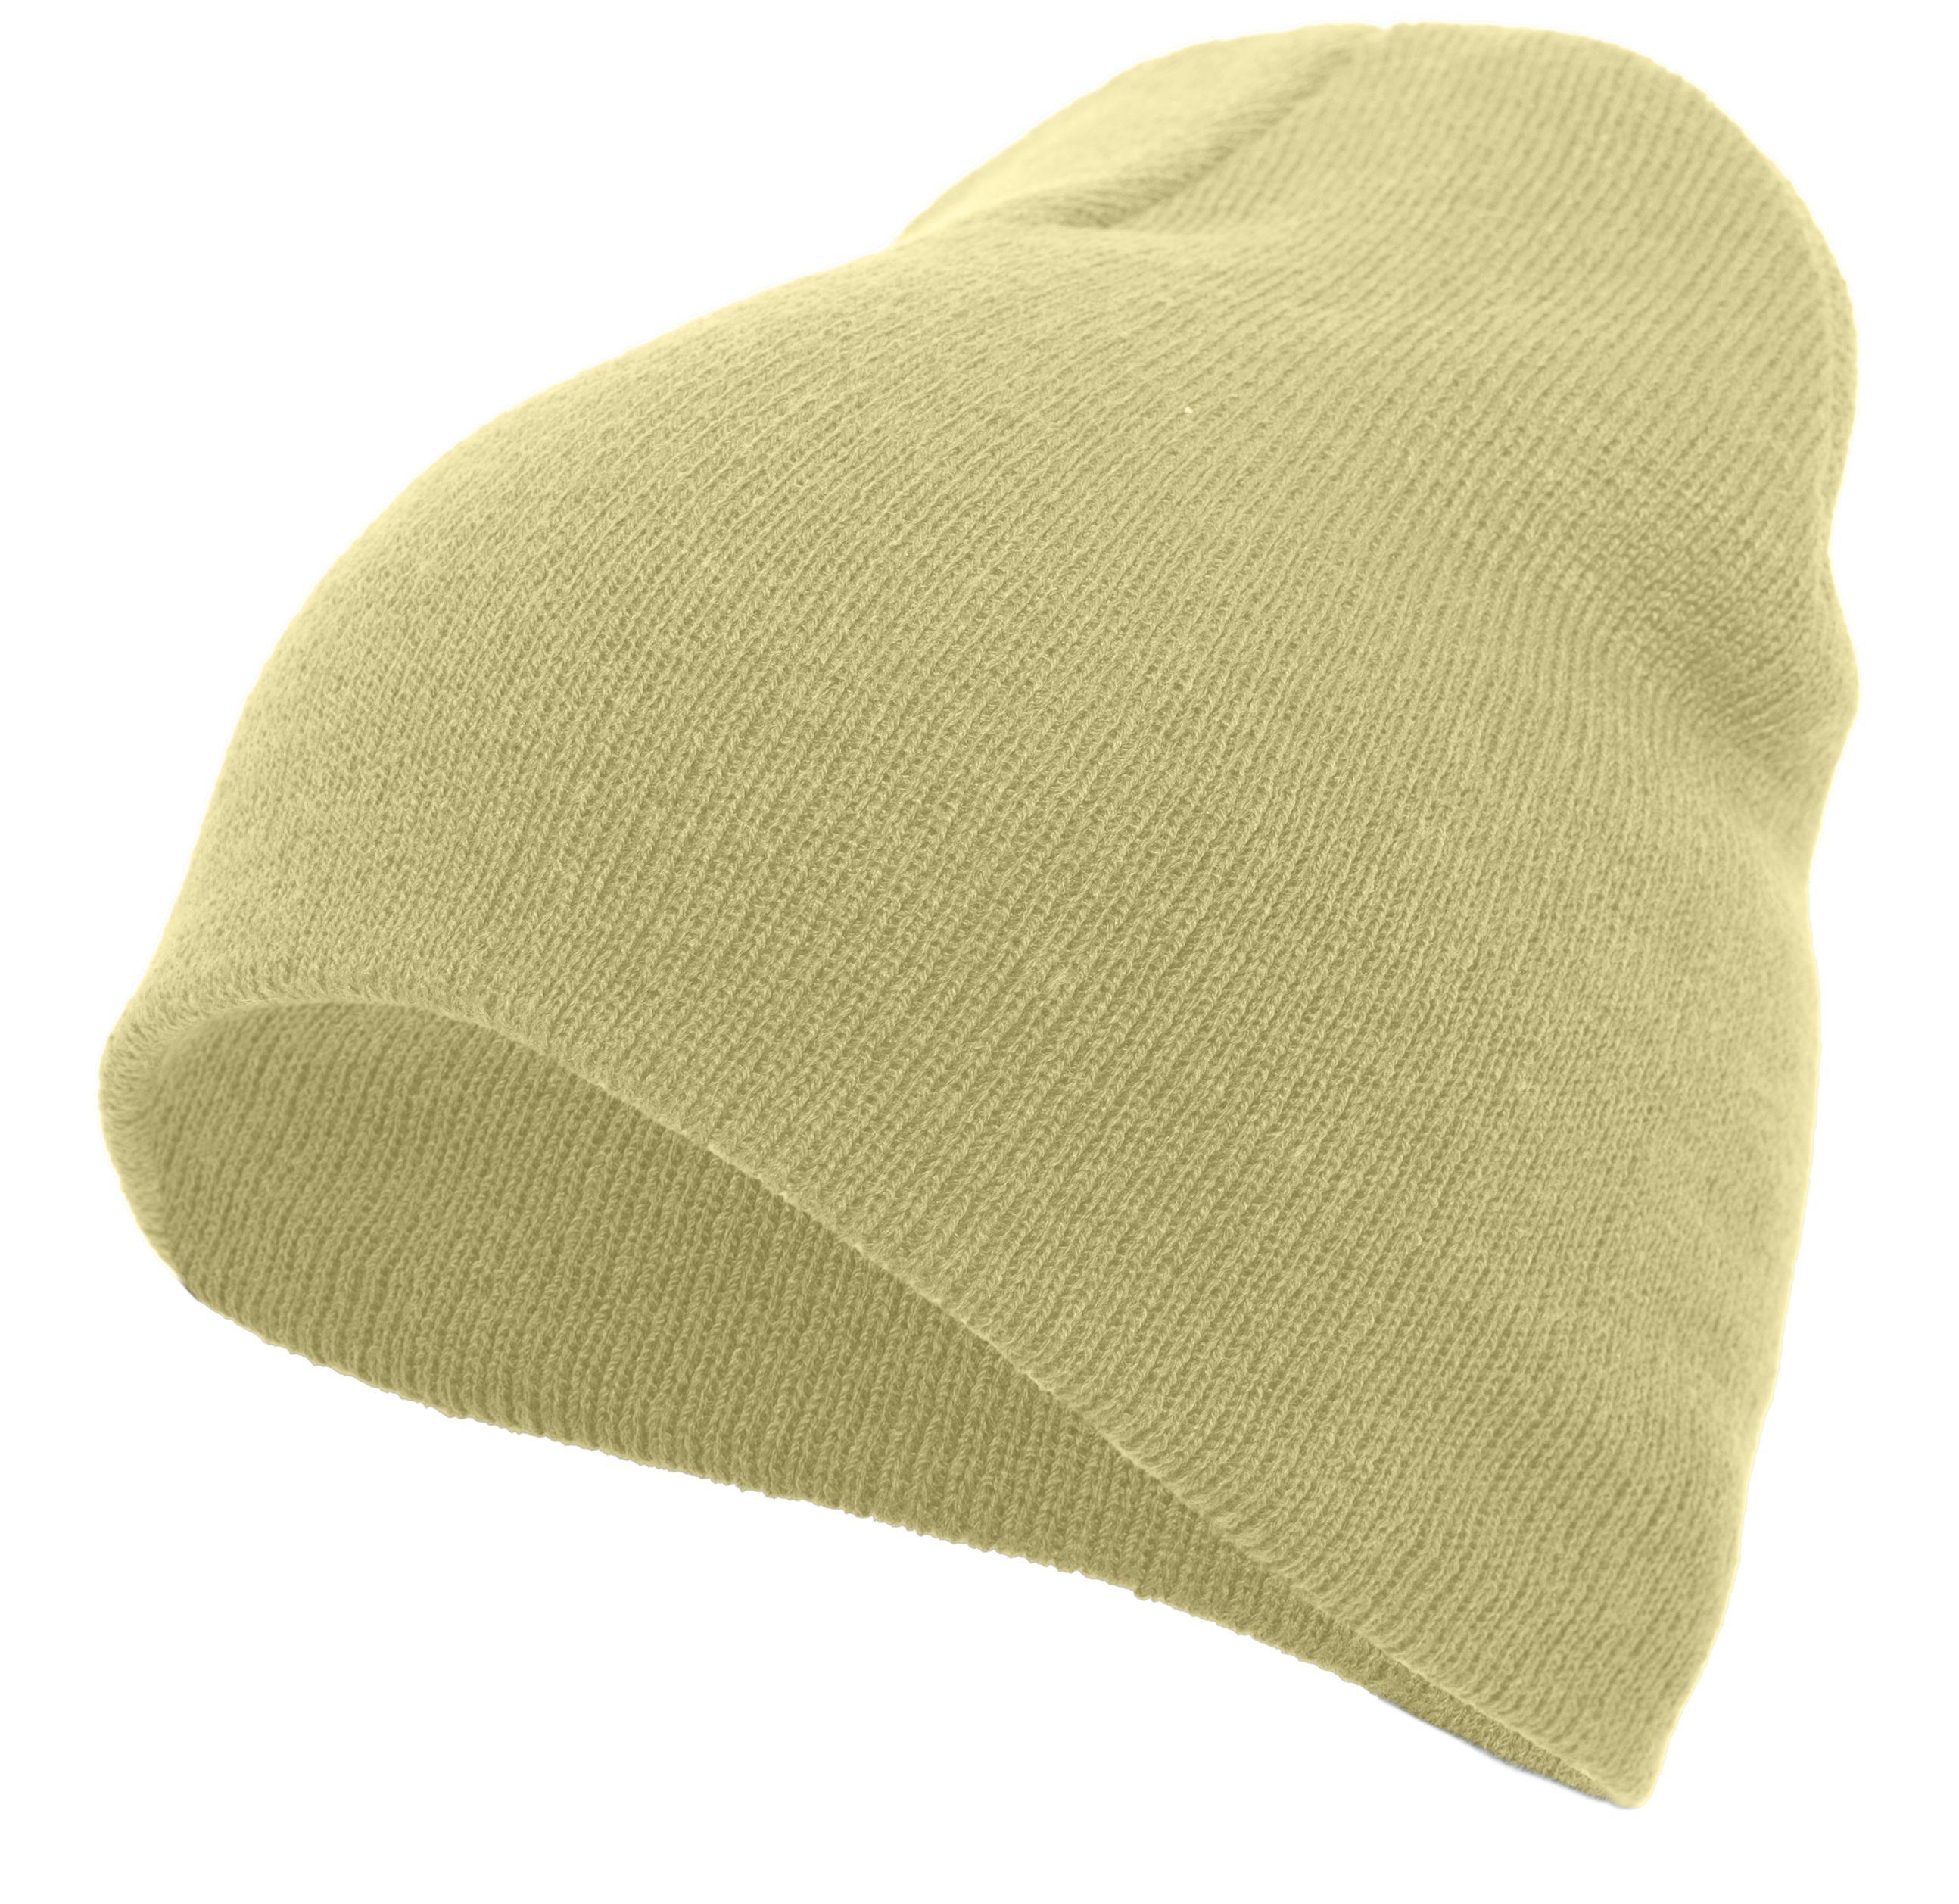 Basic Knit Beanie - VEGAS GOLD